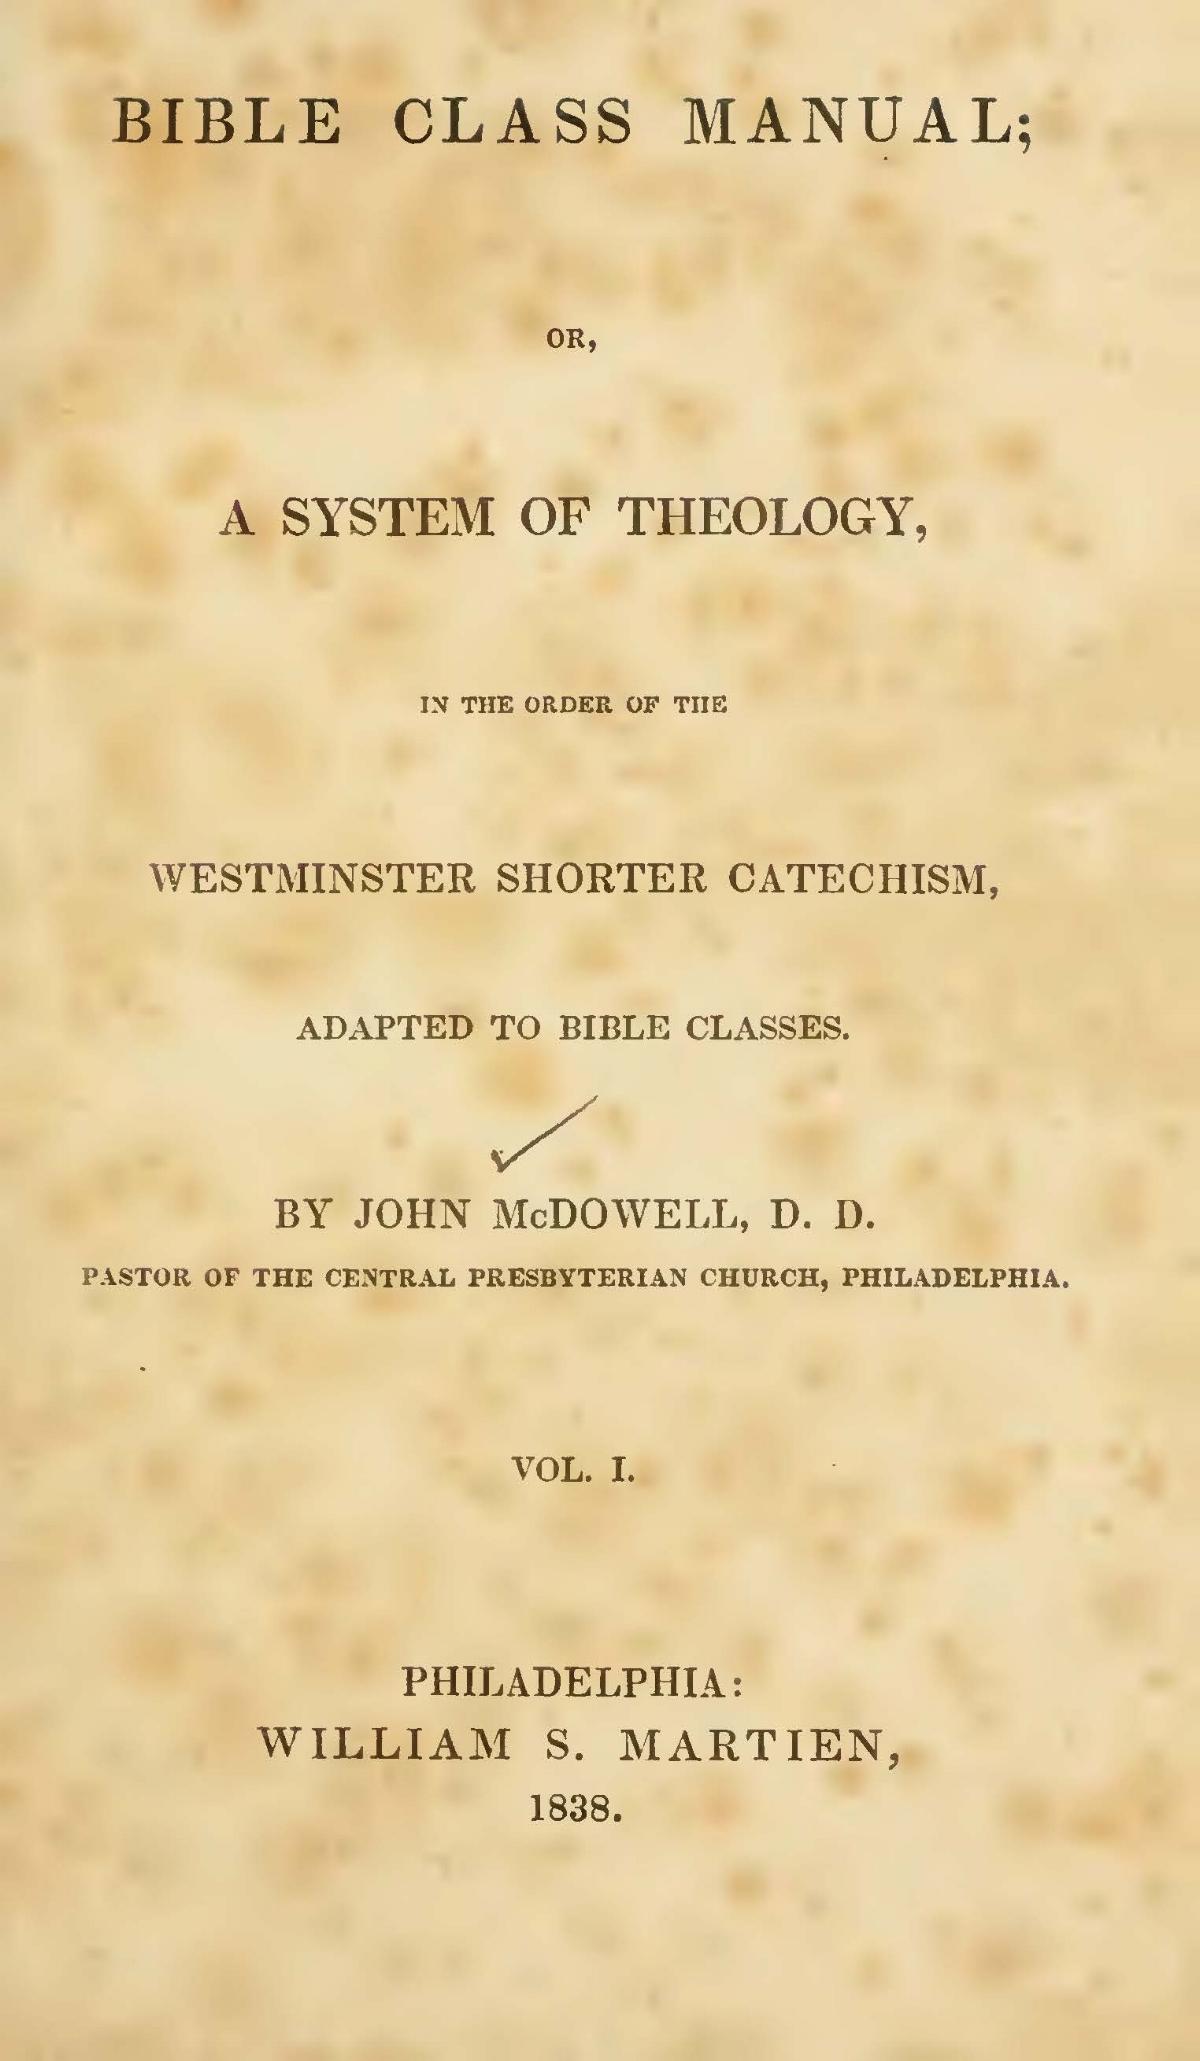 McDowell, John, Bible Class Manual, Vol. 1 Title Page.jpg